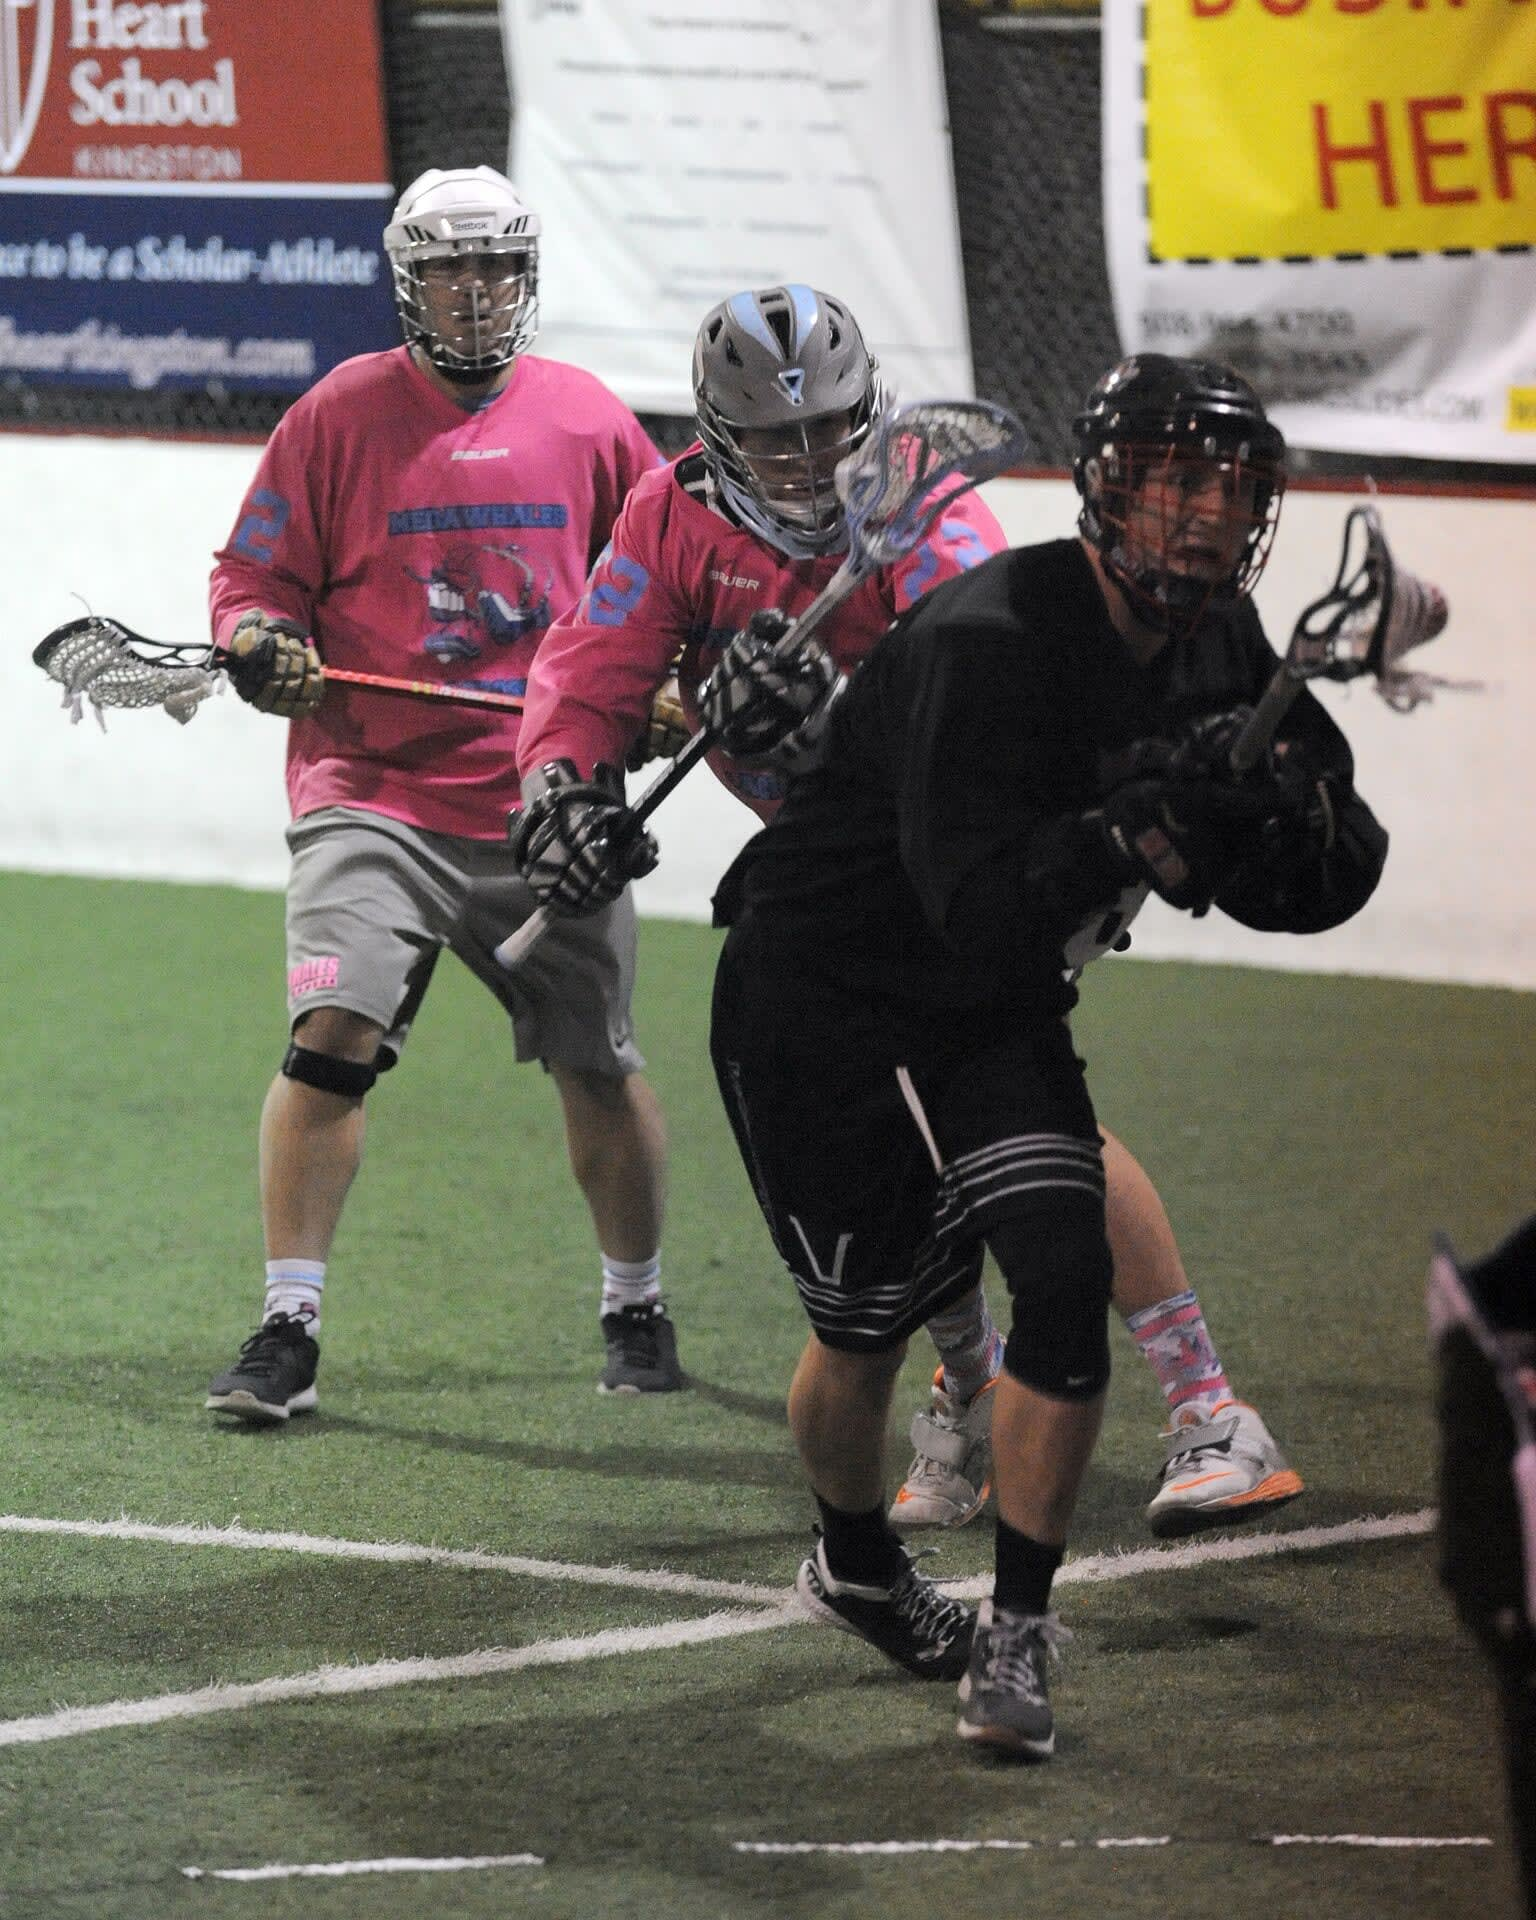 kyle baker bbll boston box lacrosse league